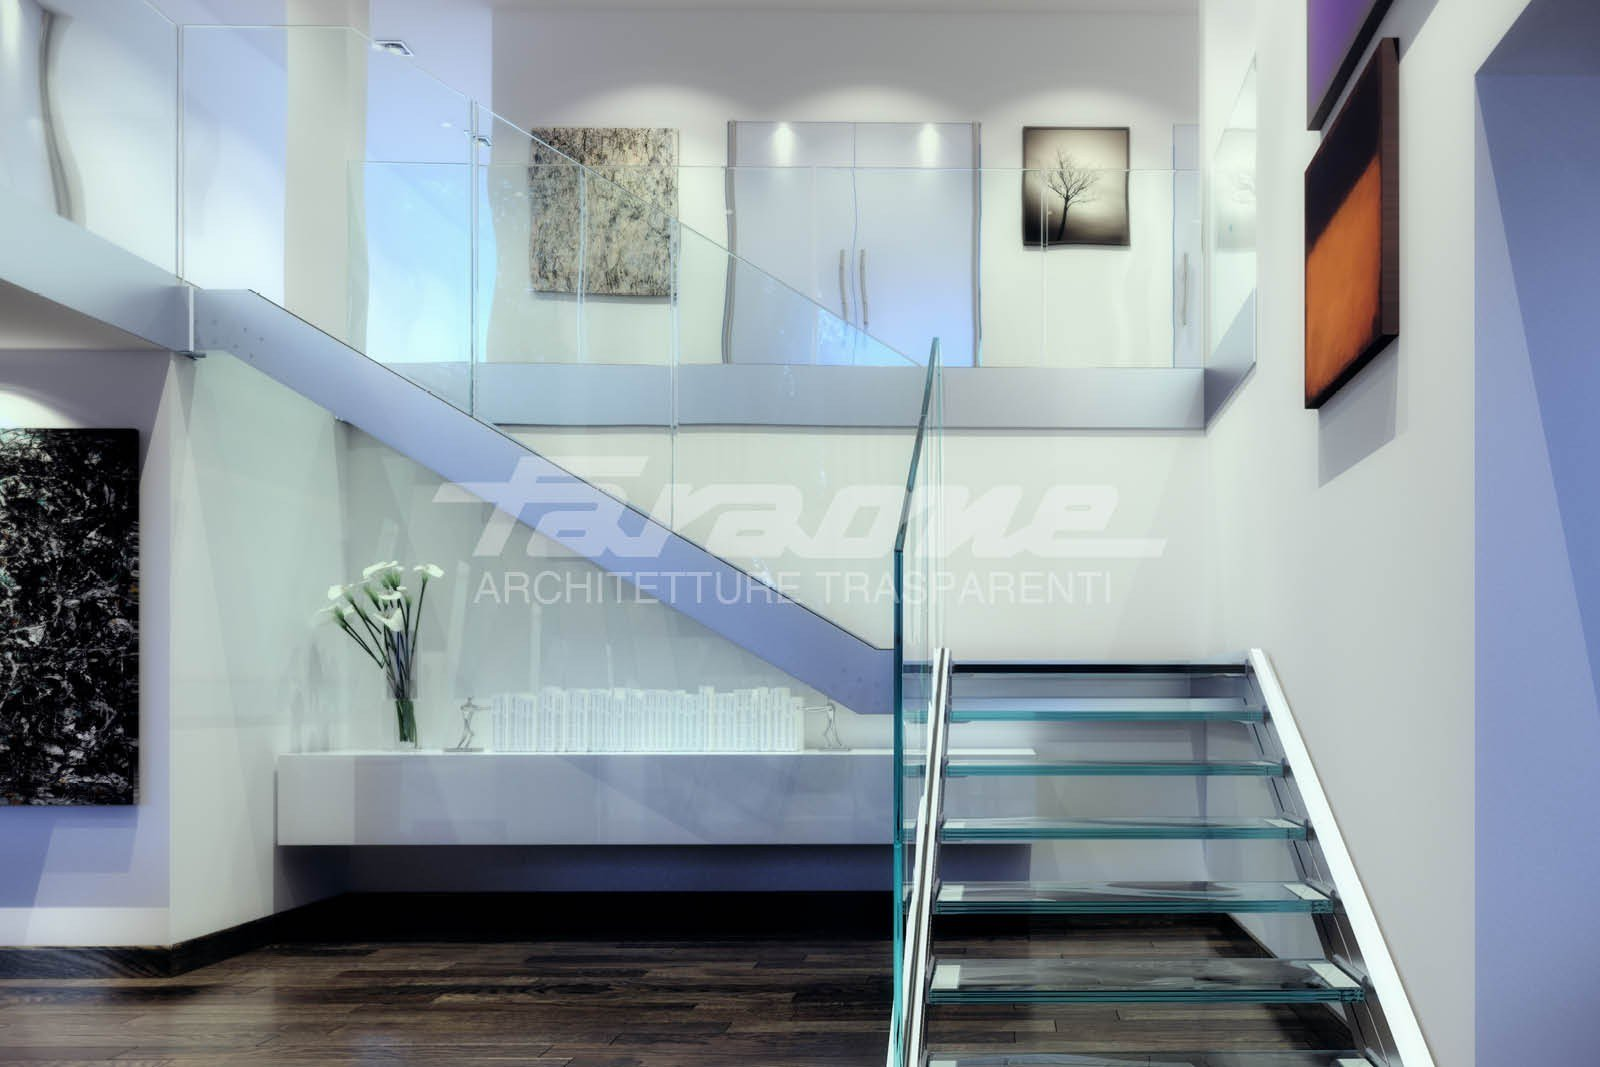 Escalier ouvert en acier et verre ninfa s by faraone - Escalier ouvert ...